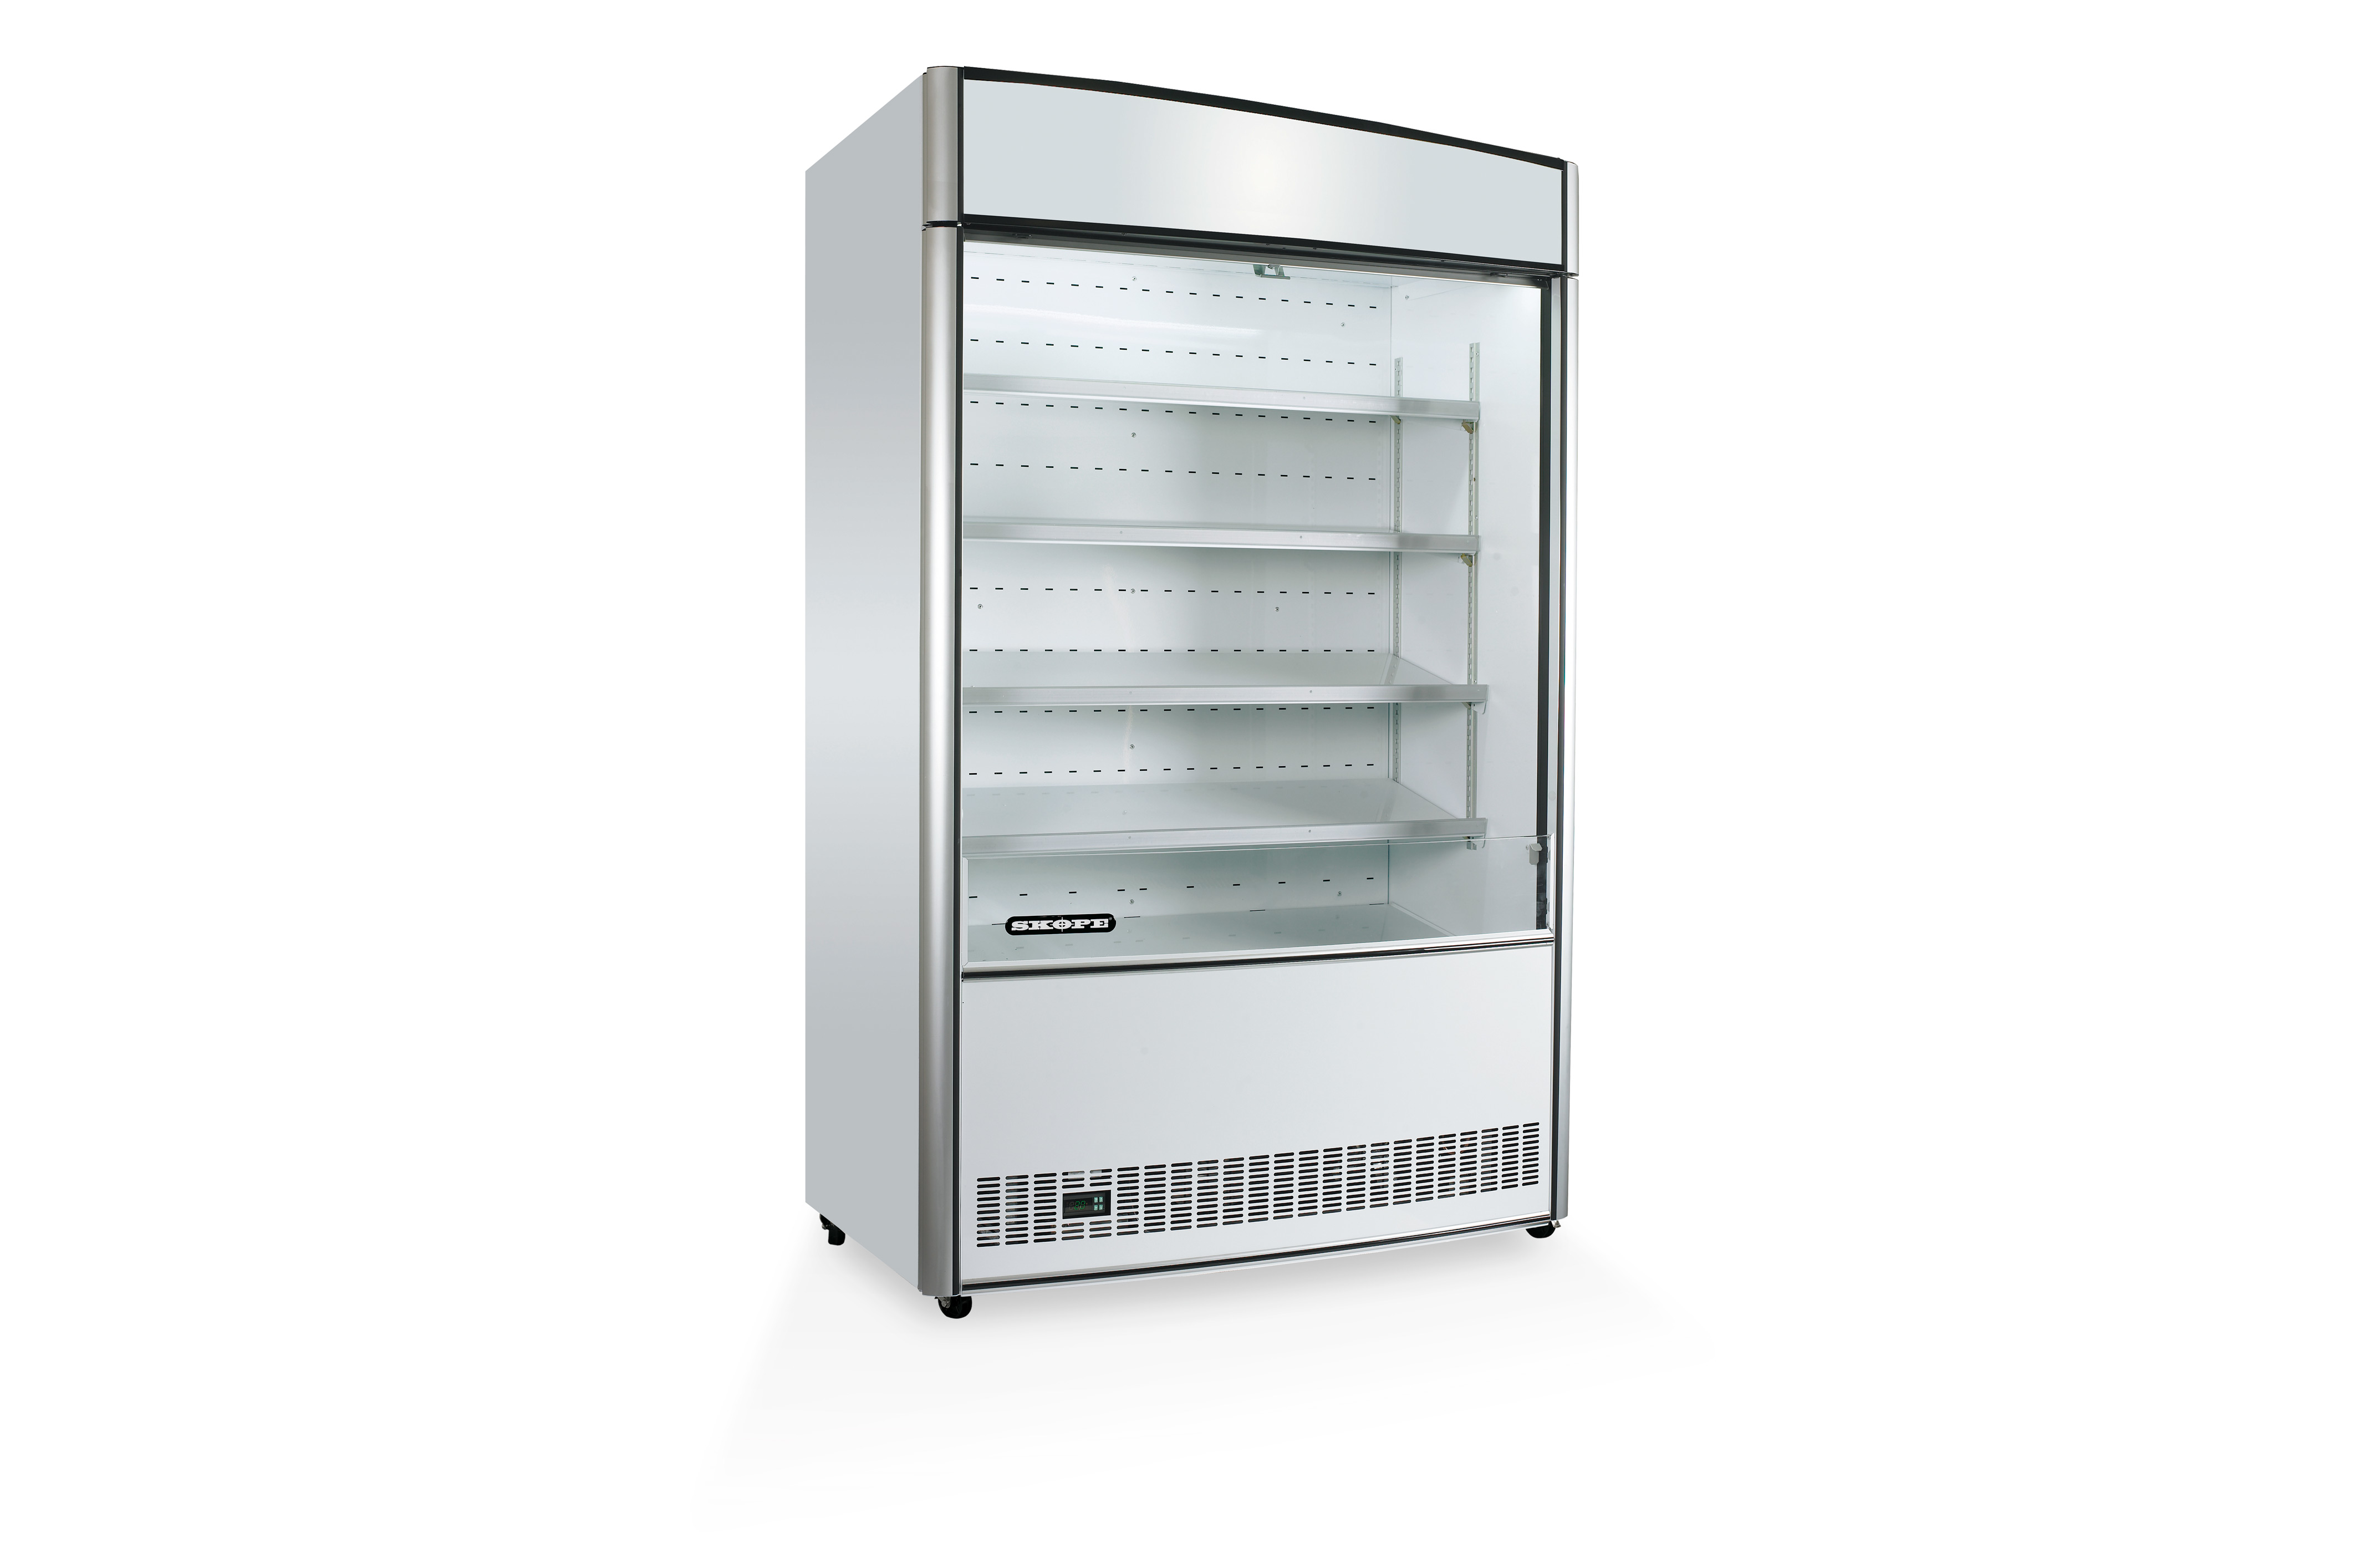 SKOPE Refrigeration